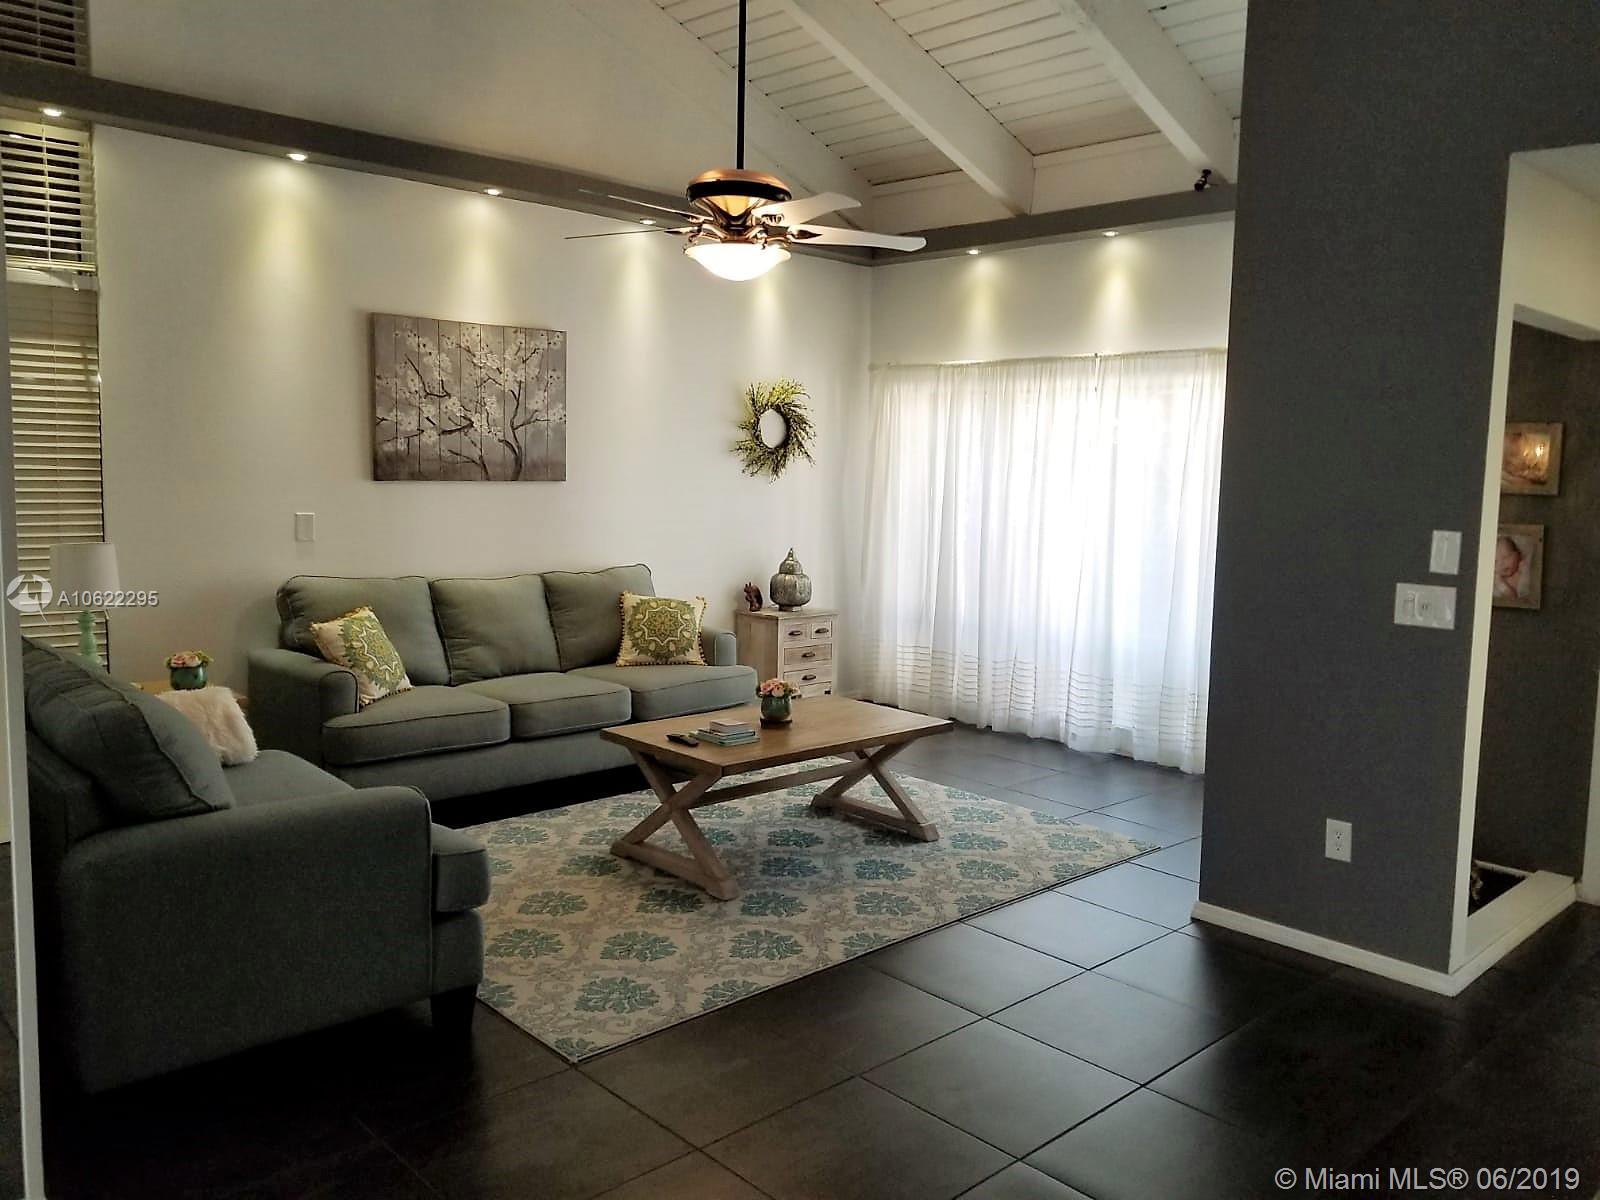 Дом в США по адресу 1024 203rd Ln, Miami, FL 33179